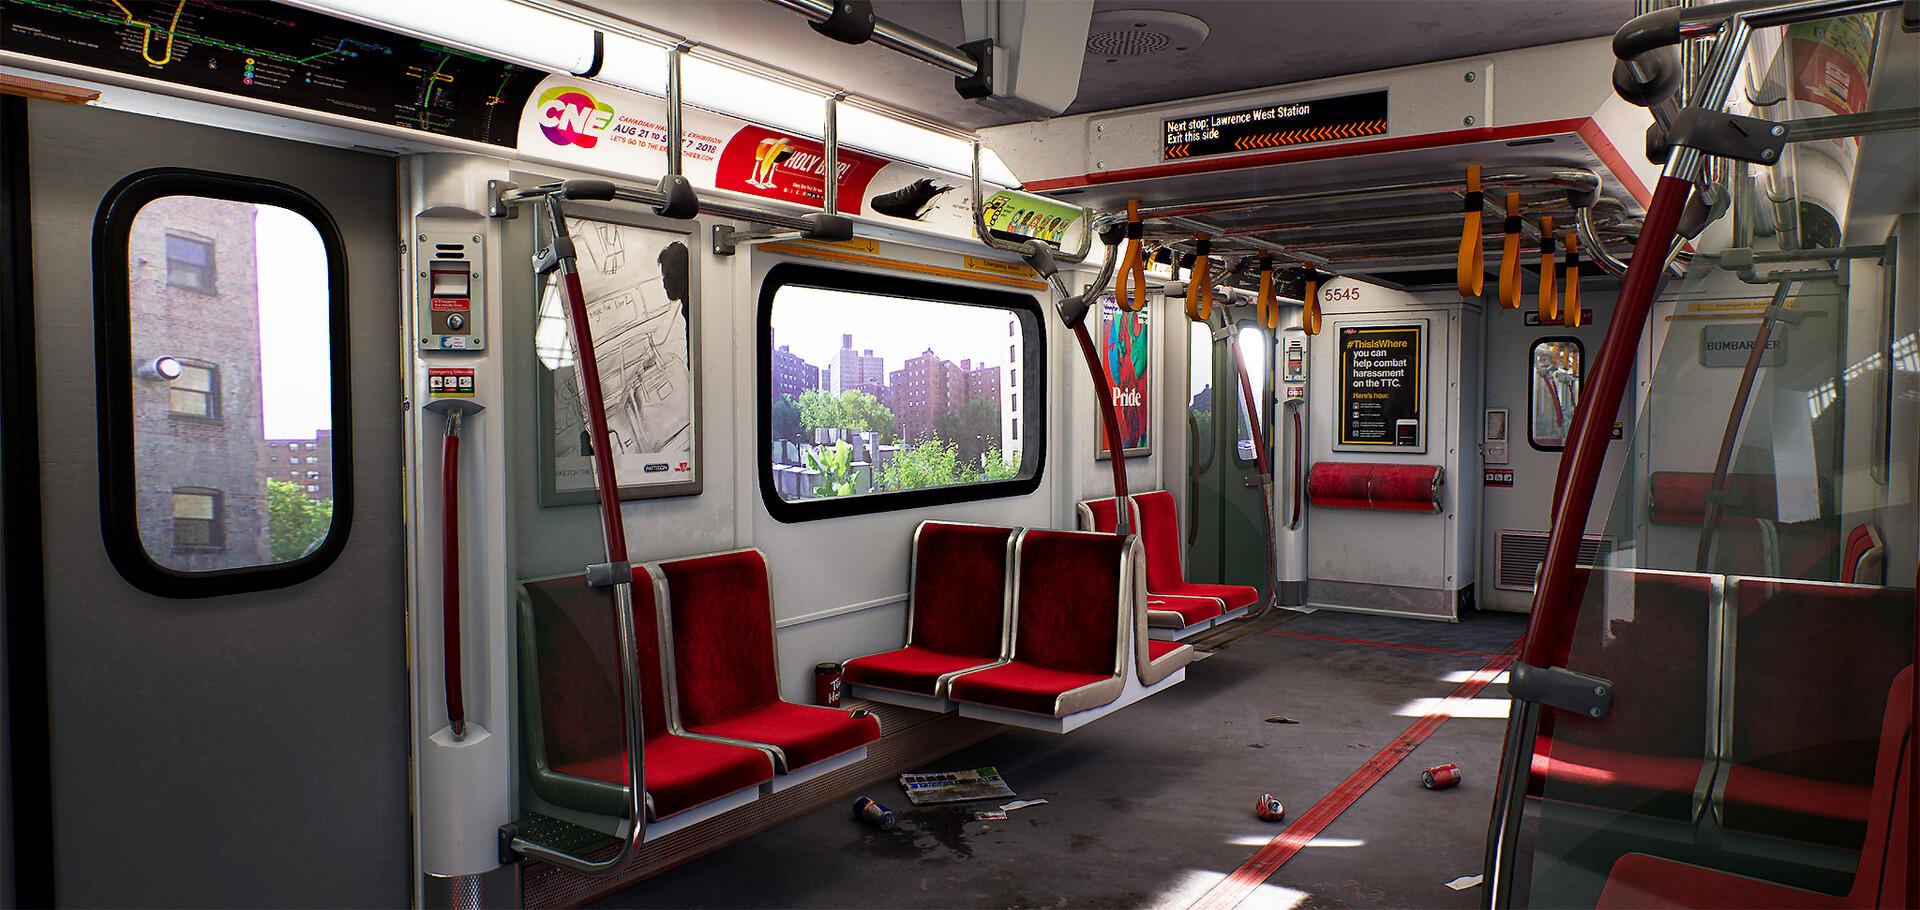 TTC (Toronto Transit Commissions) - Ashawn Masahir